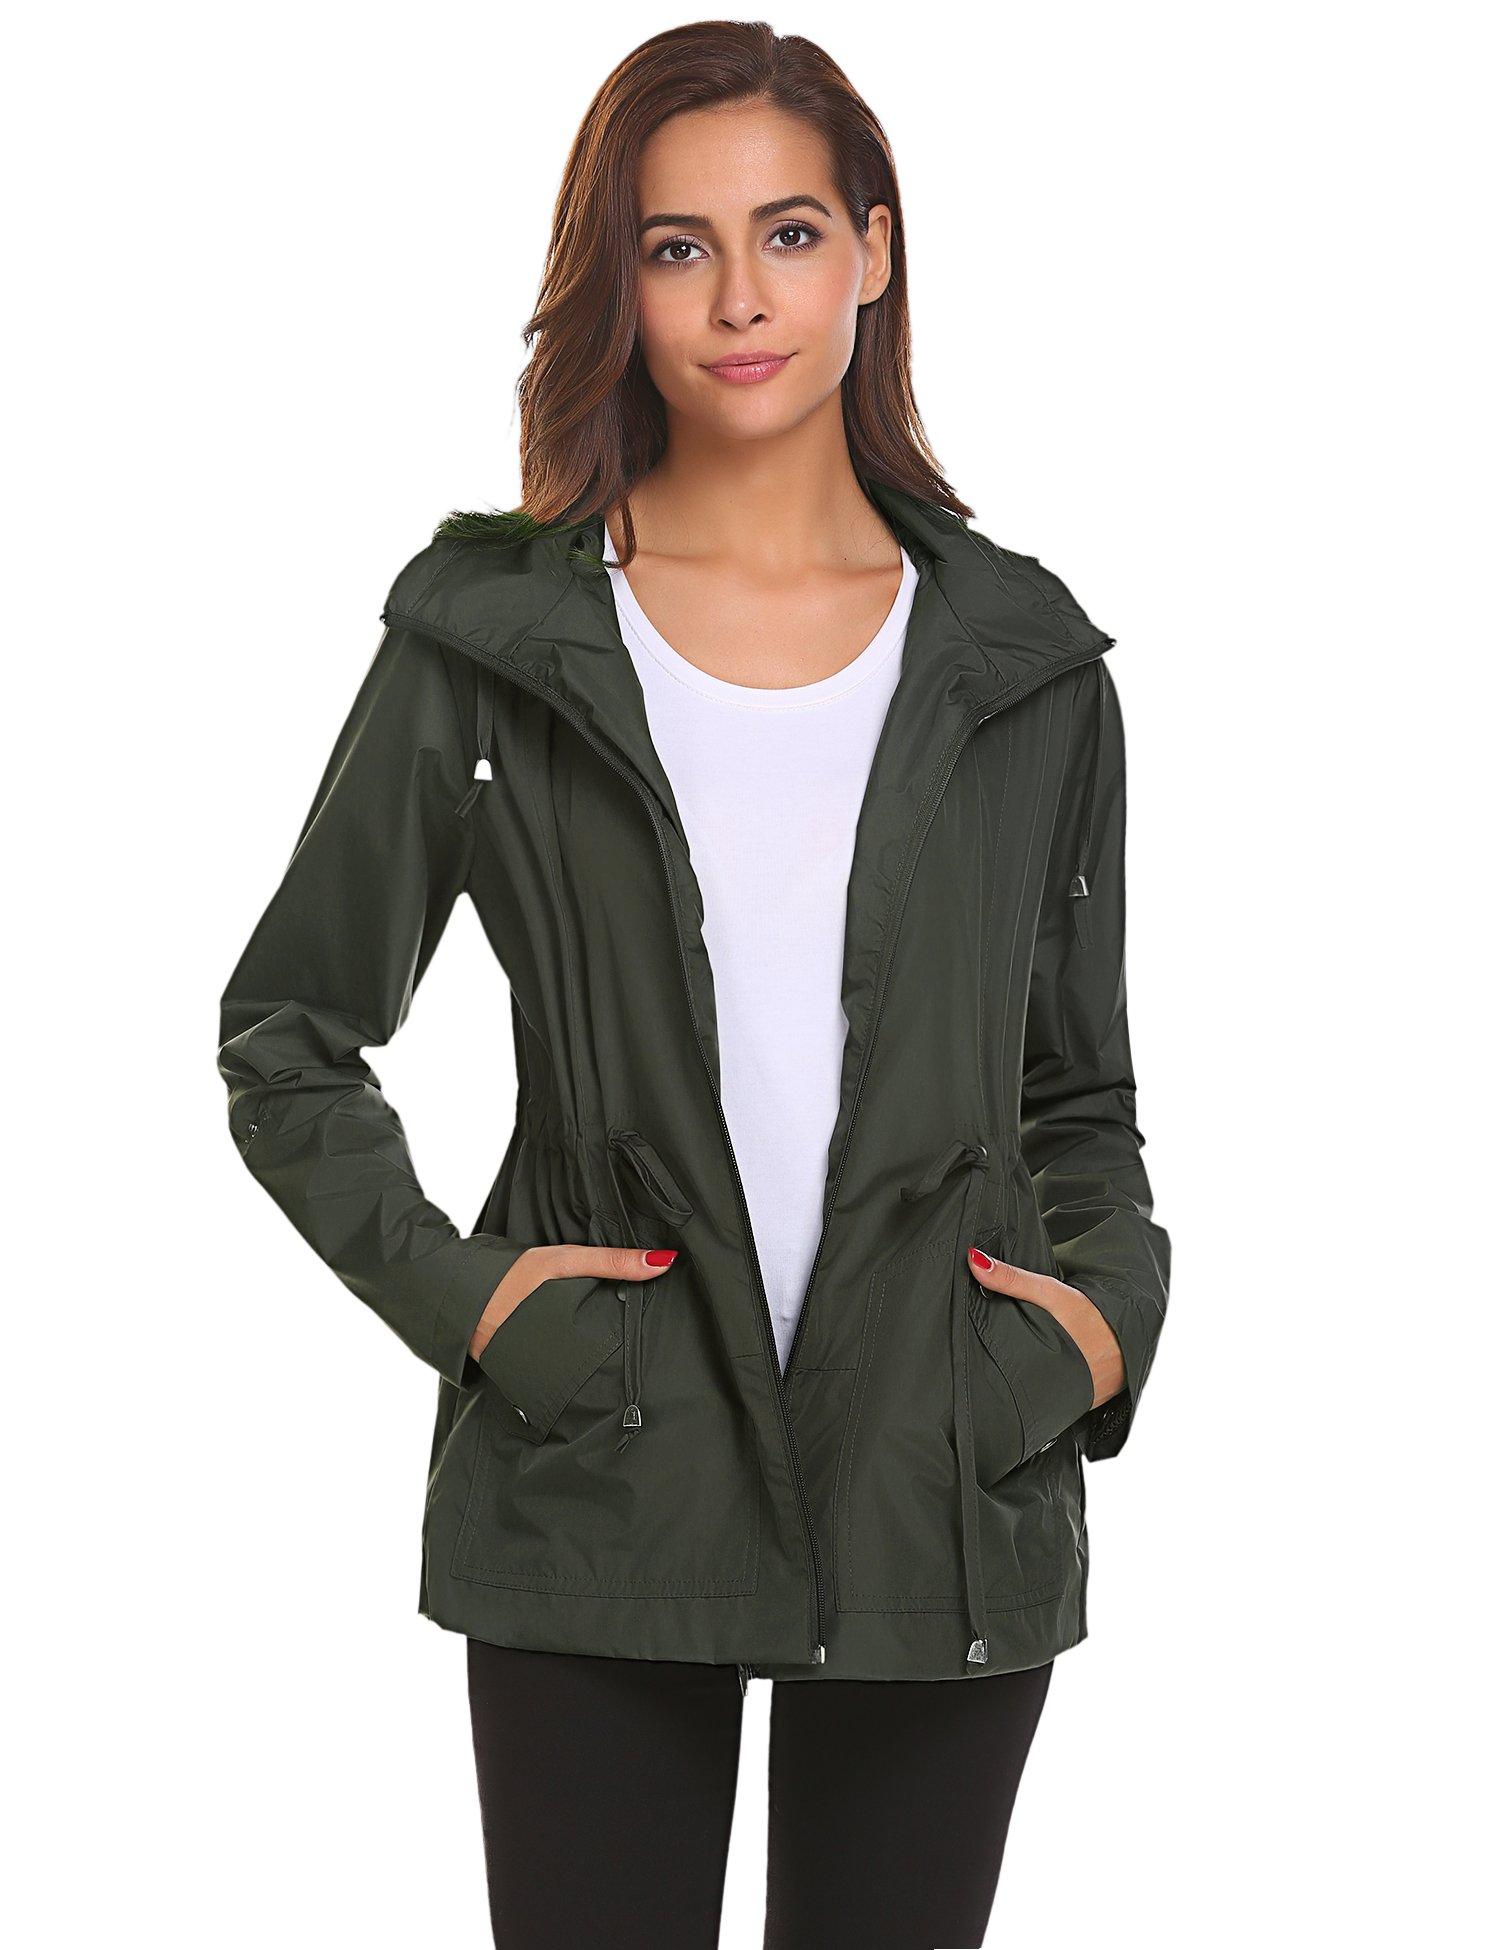 1347d4e7e Romanstii Rain Jacket Women Waterproof Hood Lightweight Raincoat ...